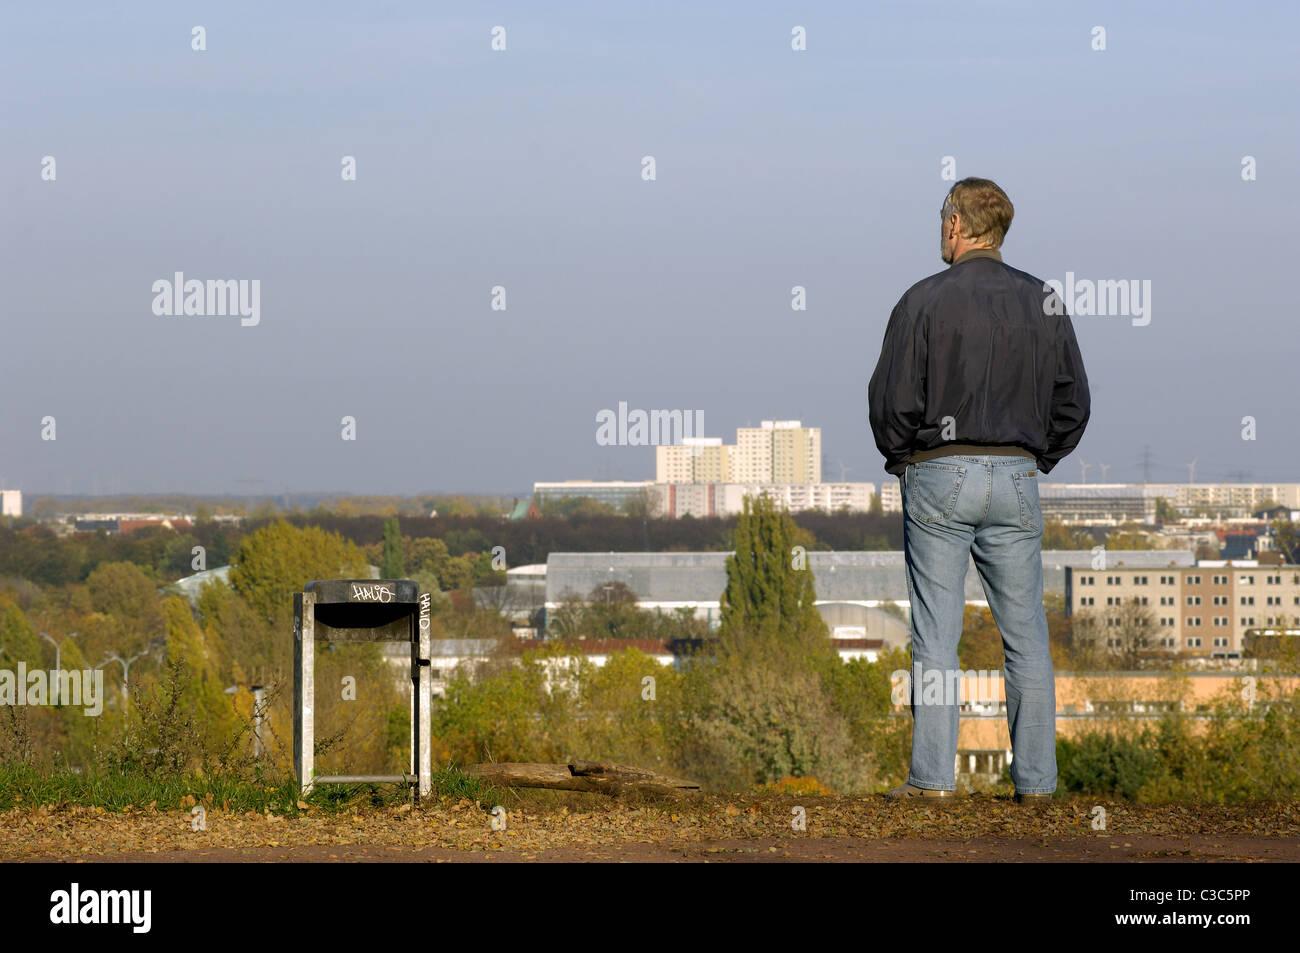 Volkspark Prenzlauer Berg, Berlin, Germany - Stock Image